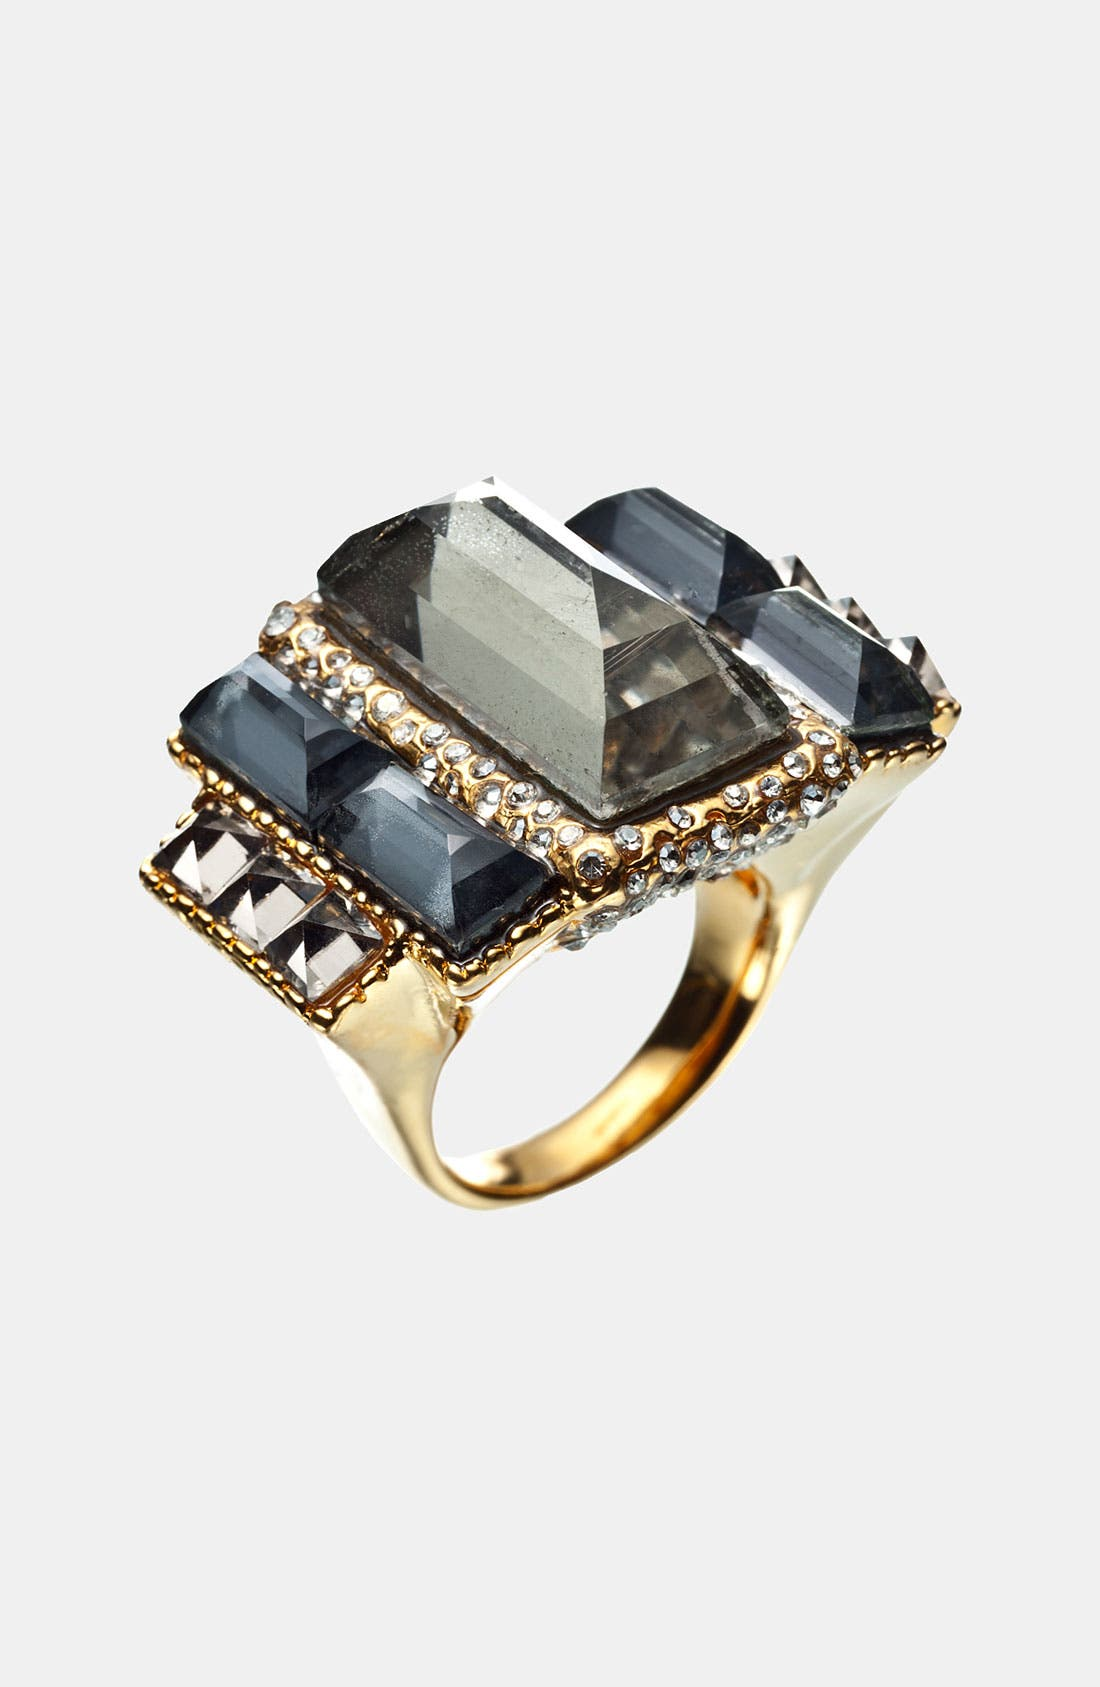 Main Image - Alexis Bittar 'Miss Havisham - Bel Air' Stone Ring (Nordstrom Exclusive)